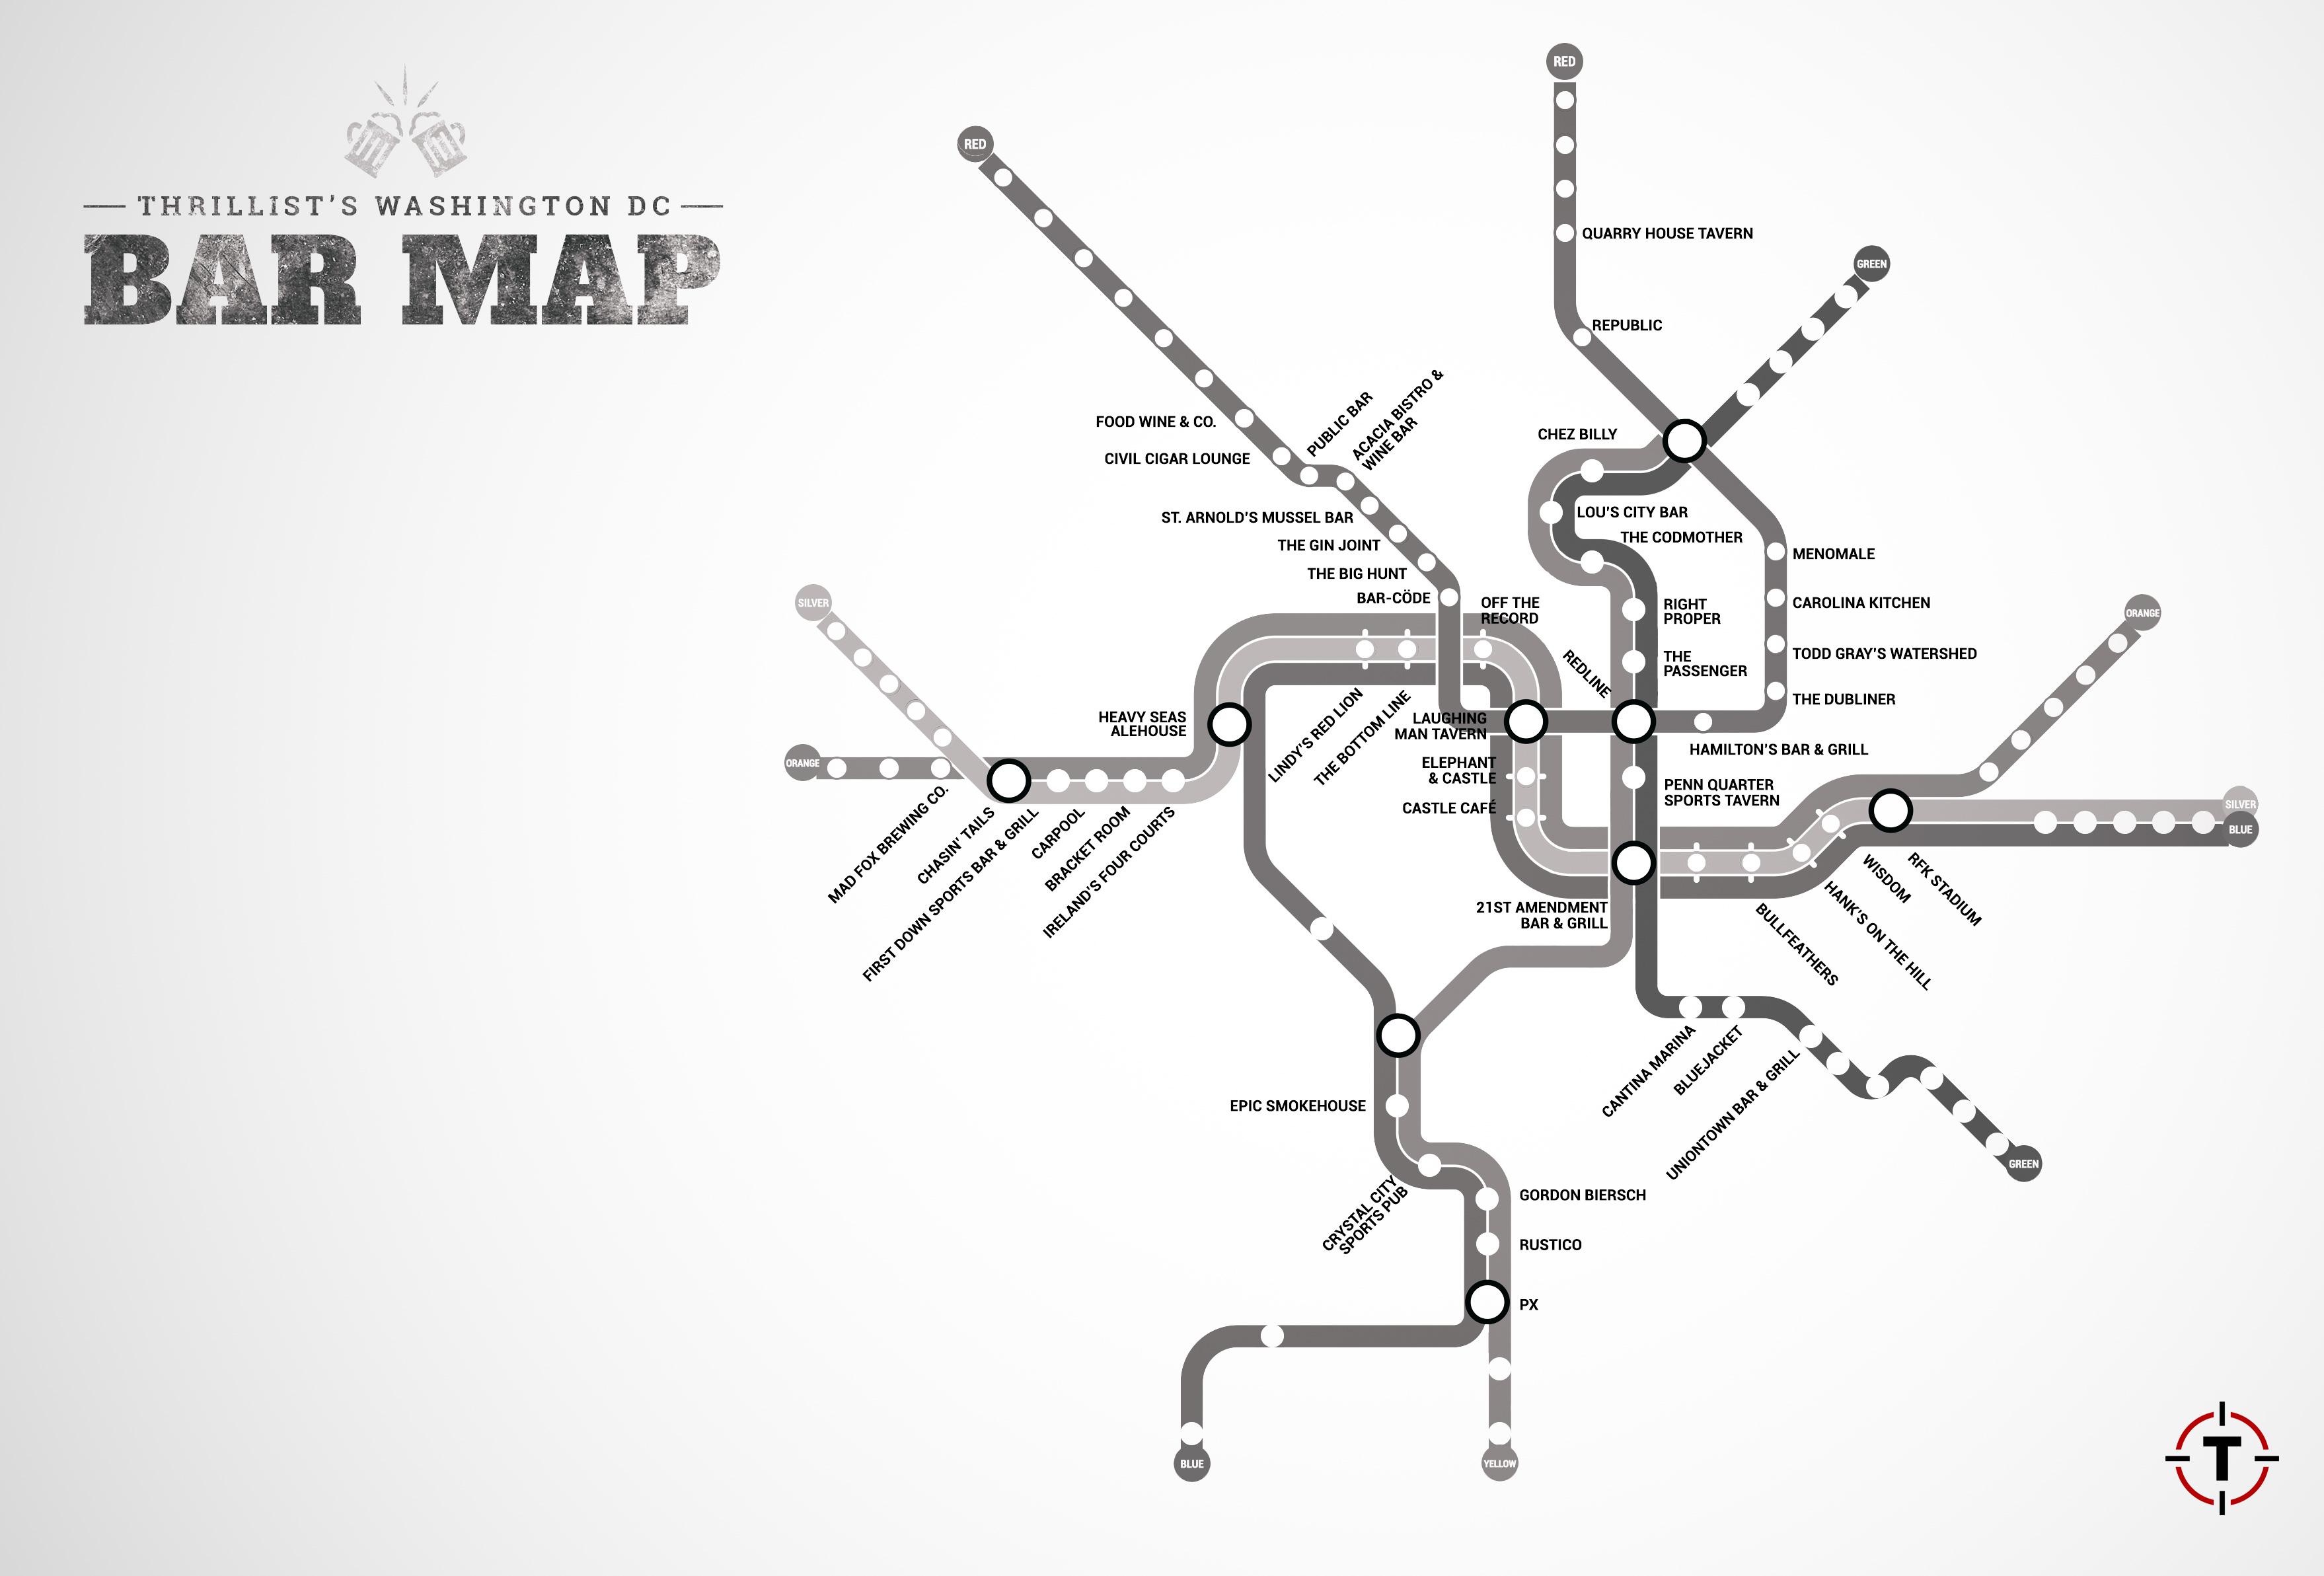 Washington DCs first map of bars near the Metro Thrillist